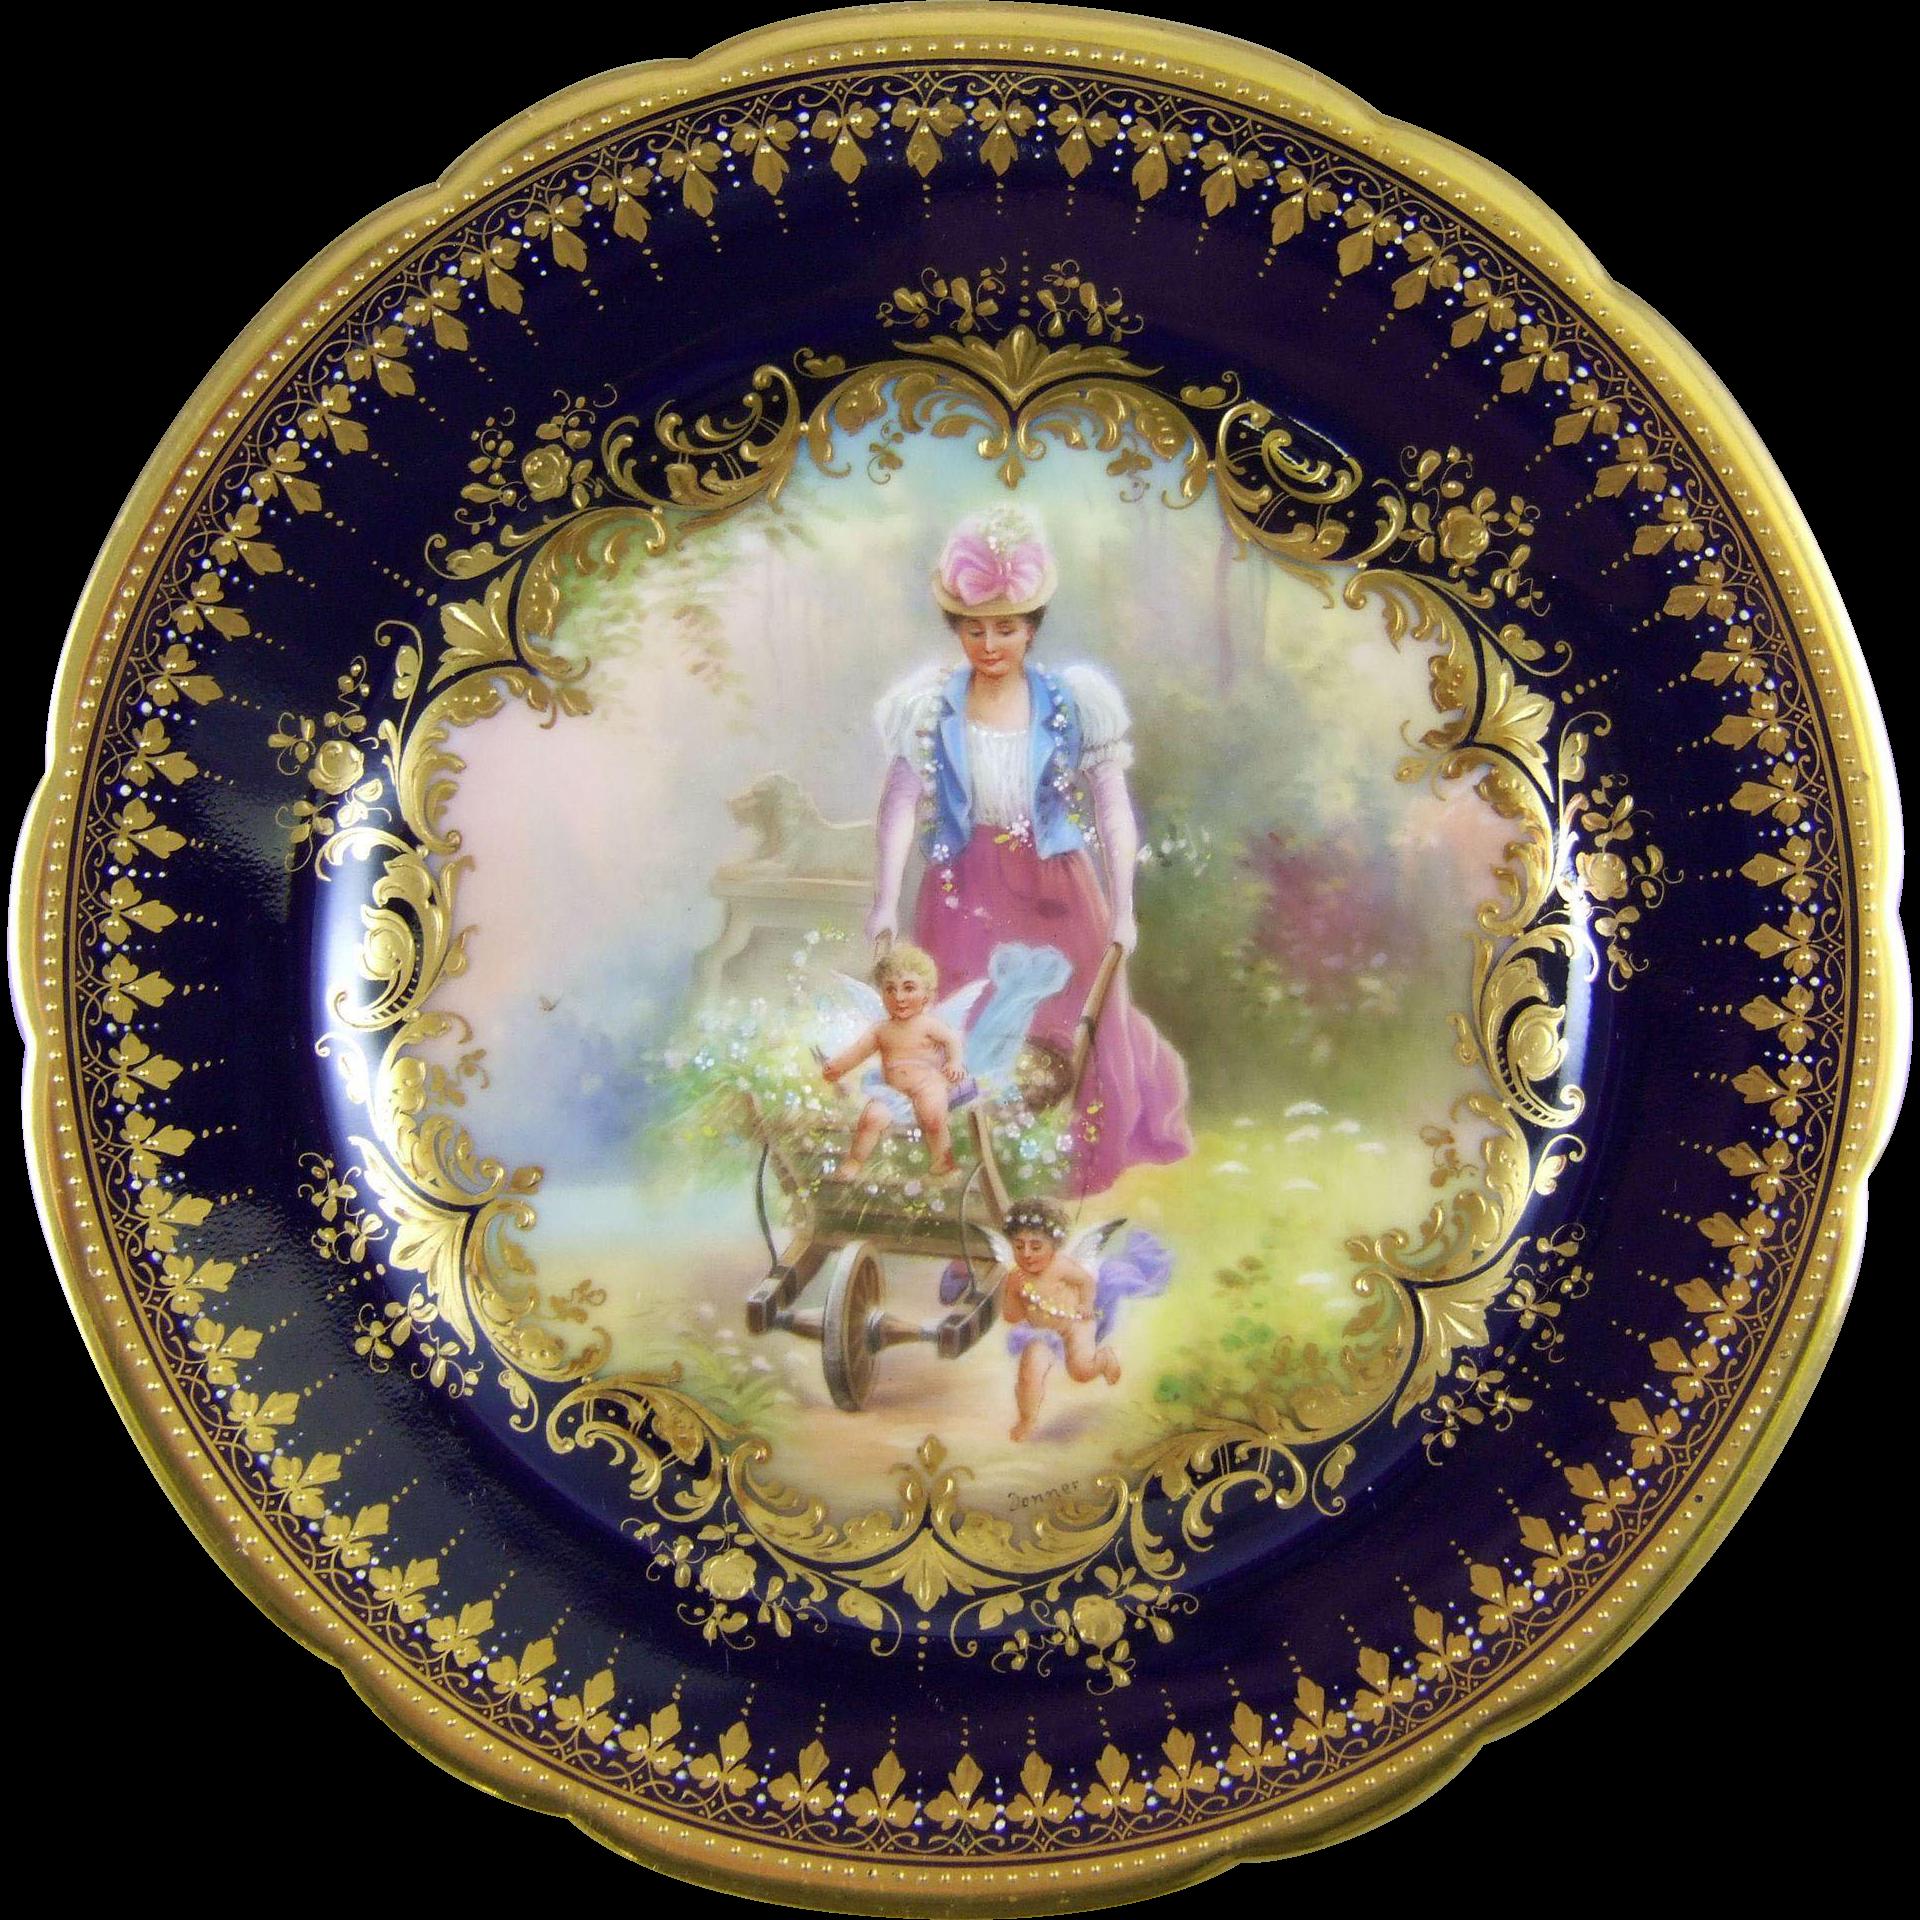 Ambrosius Lamm Dresden Germany Hand Painted Porcelain Cabinet Plate with Hans Zatzka Decoration - Leibe im Galopp